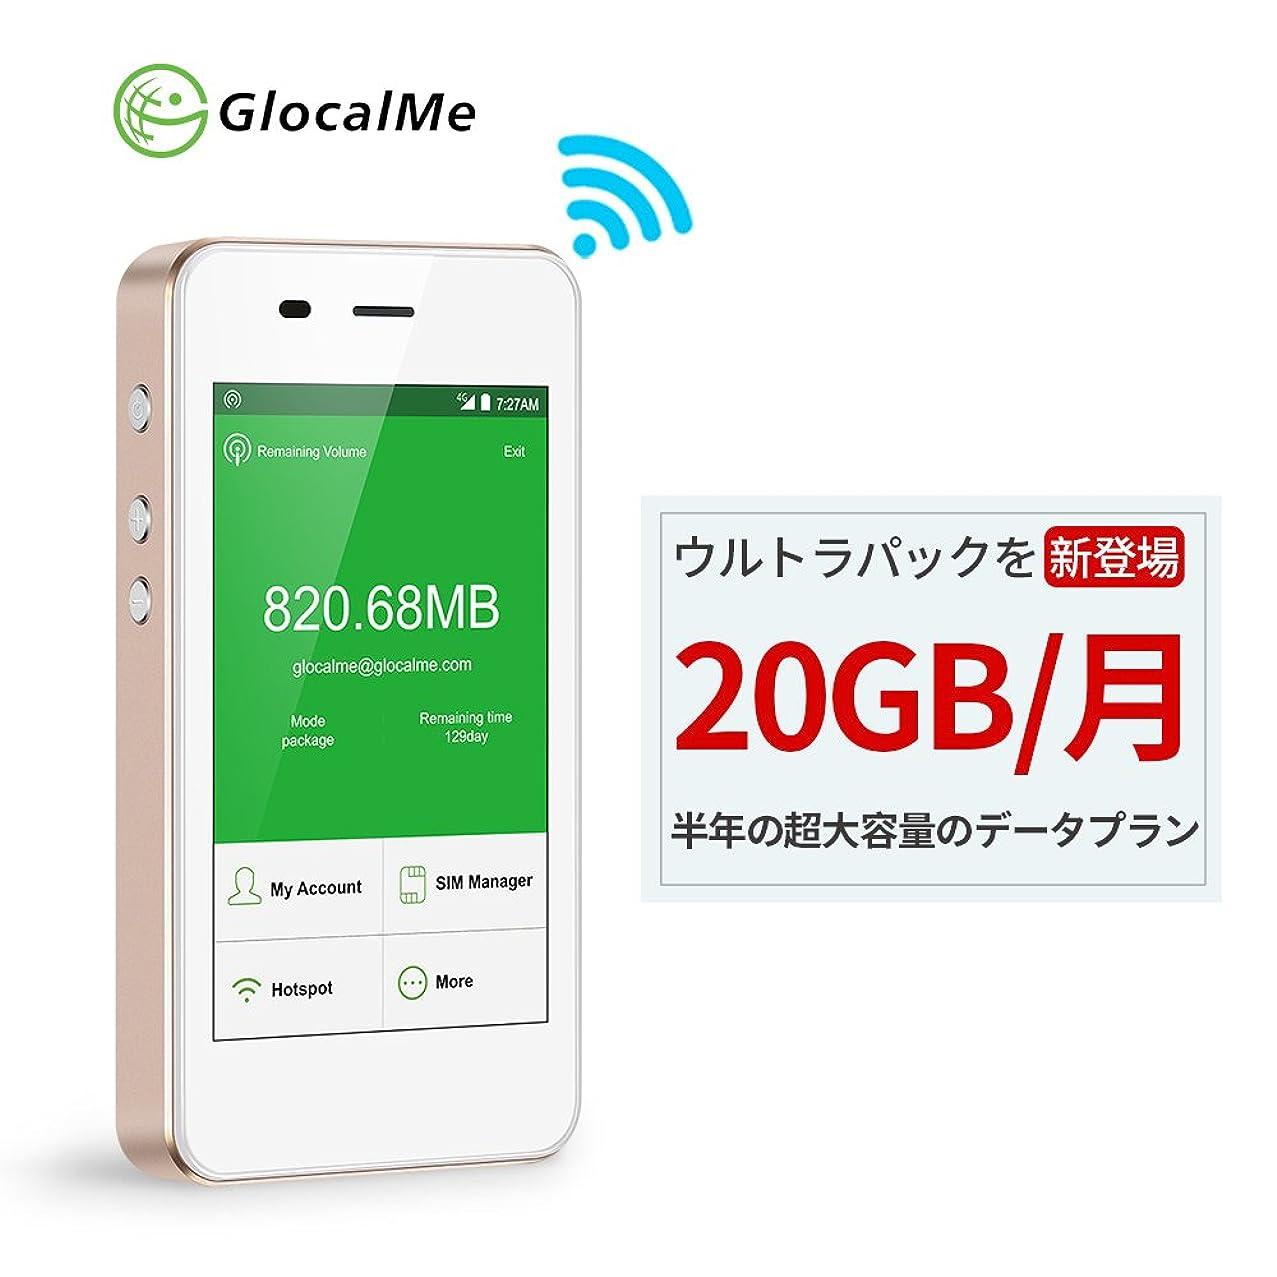 GlocalMe G3 モバイル Wi-Fi ルーター 日本国内ギガモンスター 毎月20GBプラン高速データ付け 高速4G LTE simフリー Pocket Mi-Fi スマートフォン?タブレット?パソコン全機種対応 超軽くて携帯便利 お盆 国内?海外旅行最適 (ゴールド)